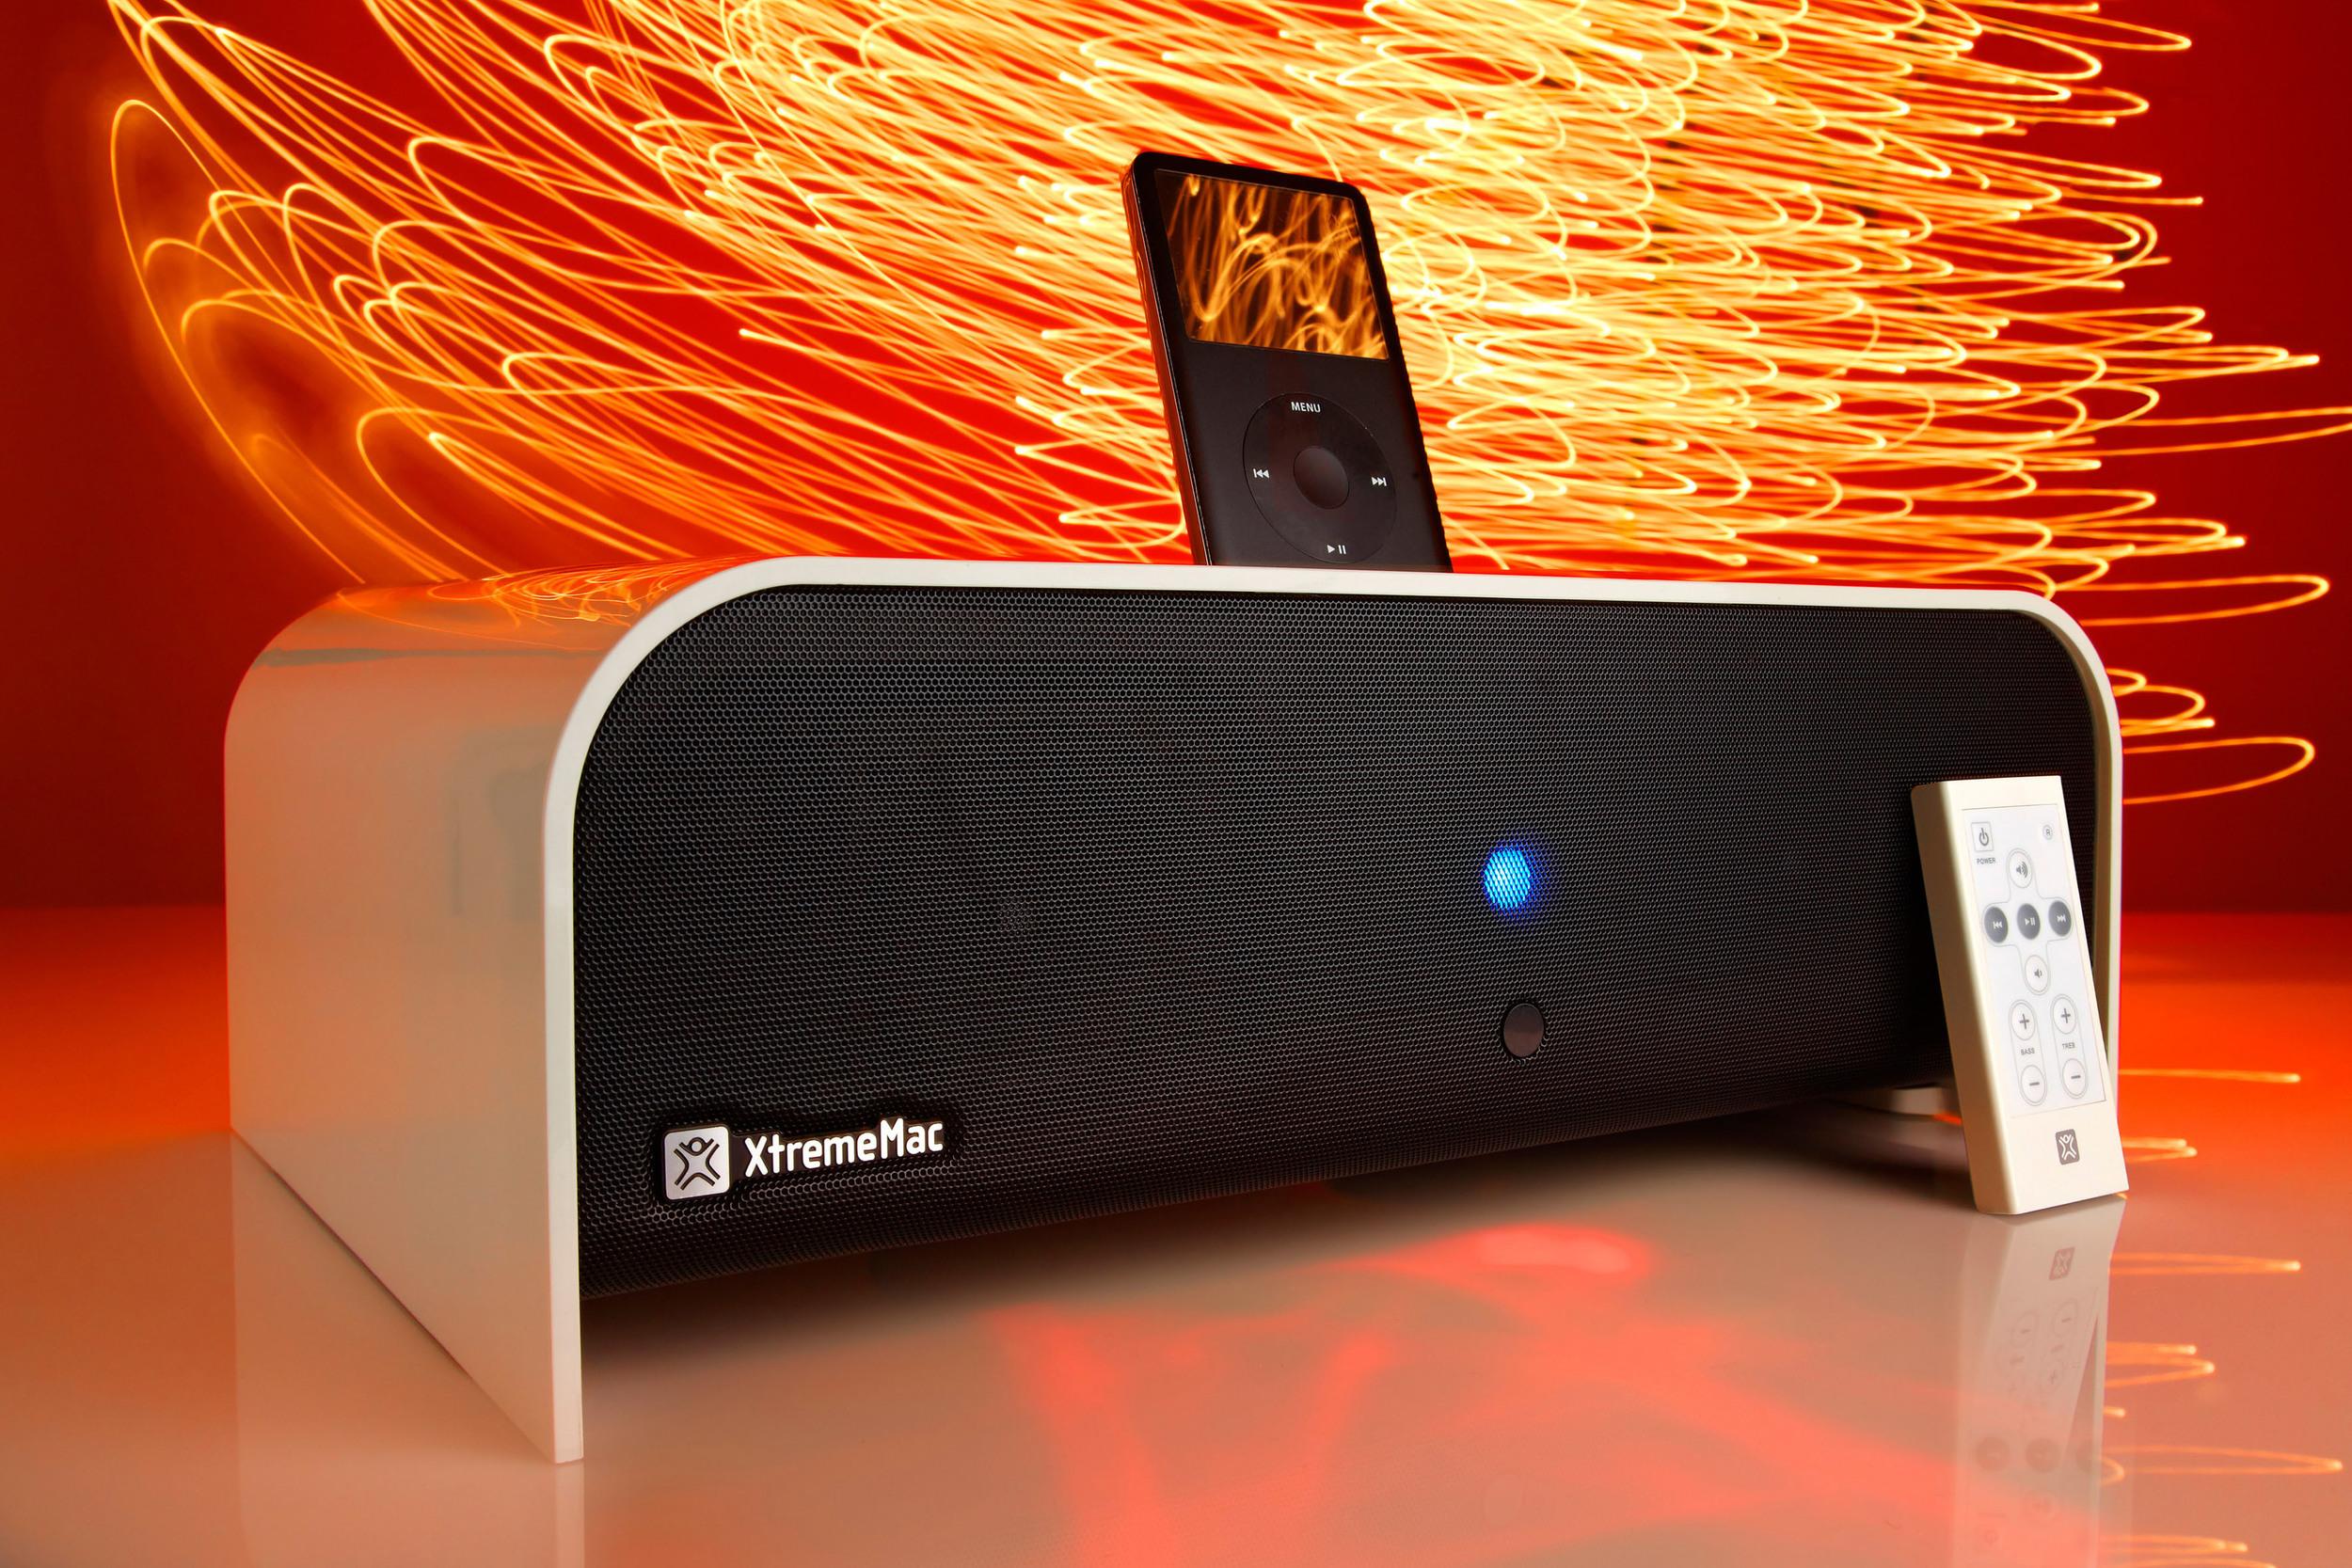 Xtreme mac 2 new remote warmer a.jpg